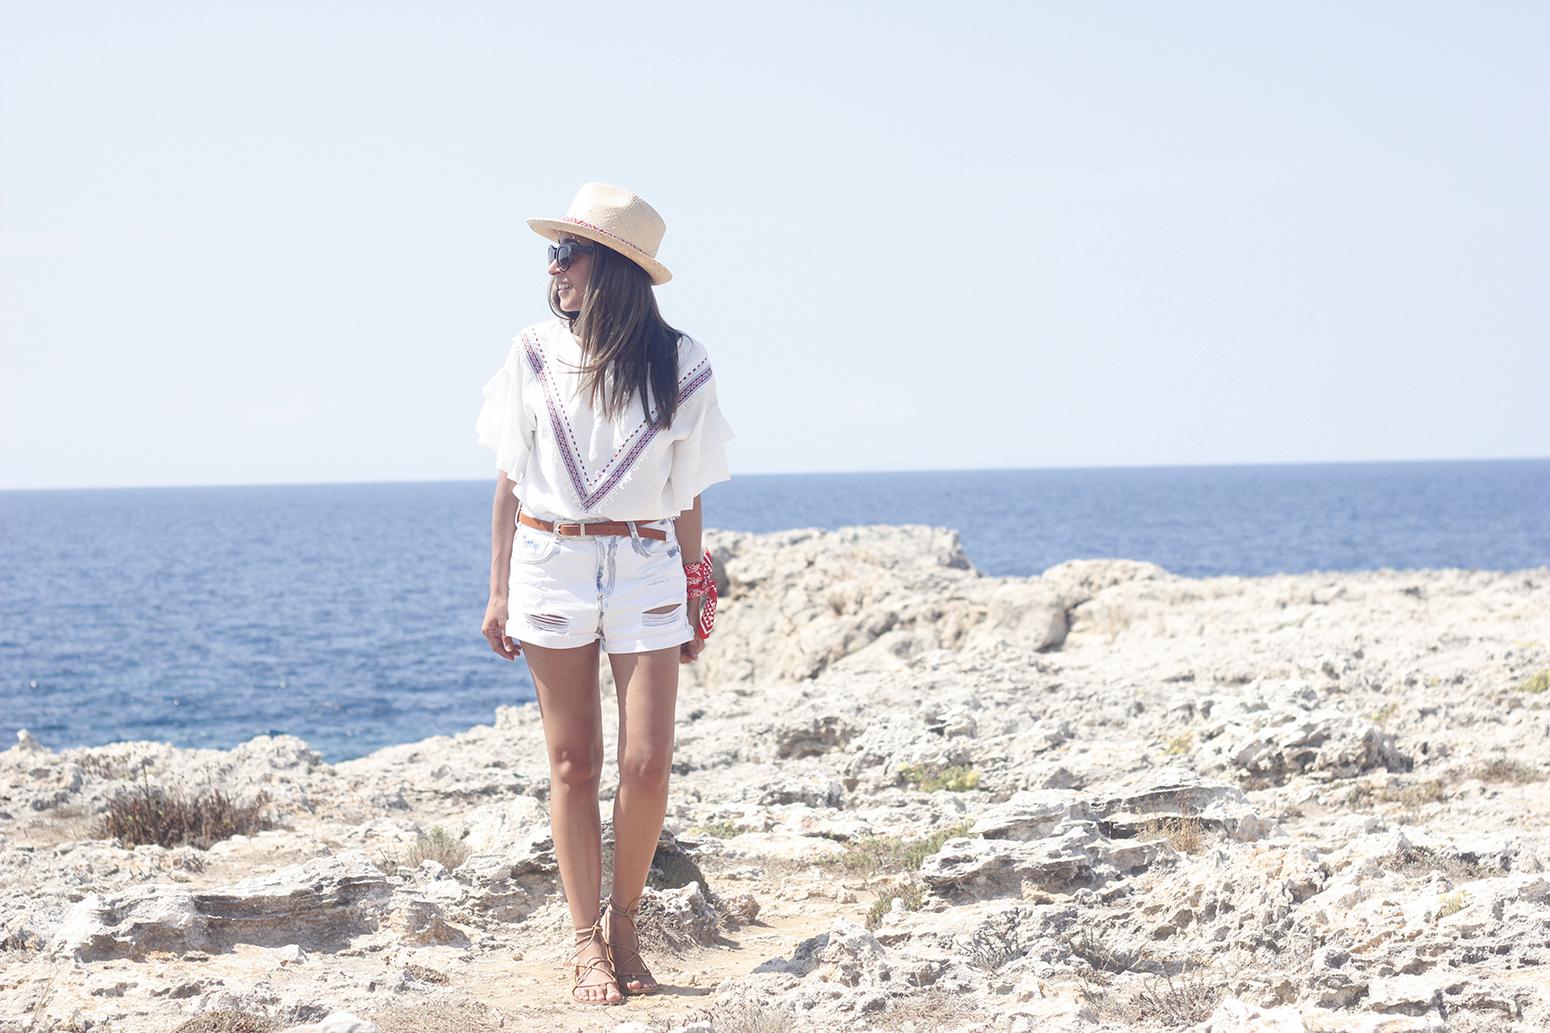 White Summer look bandana beach outfit02